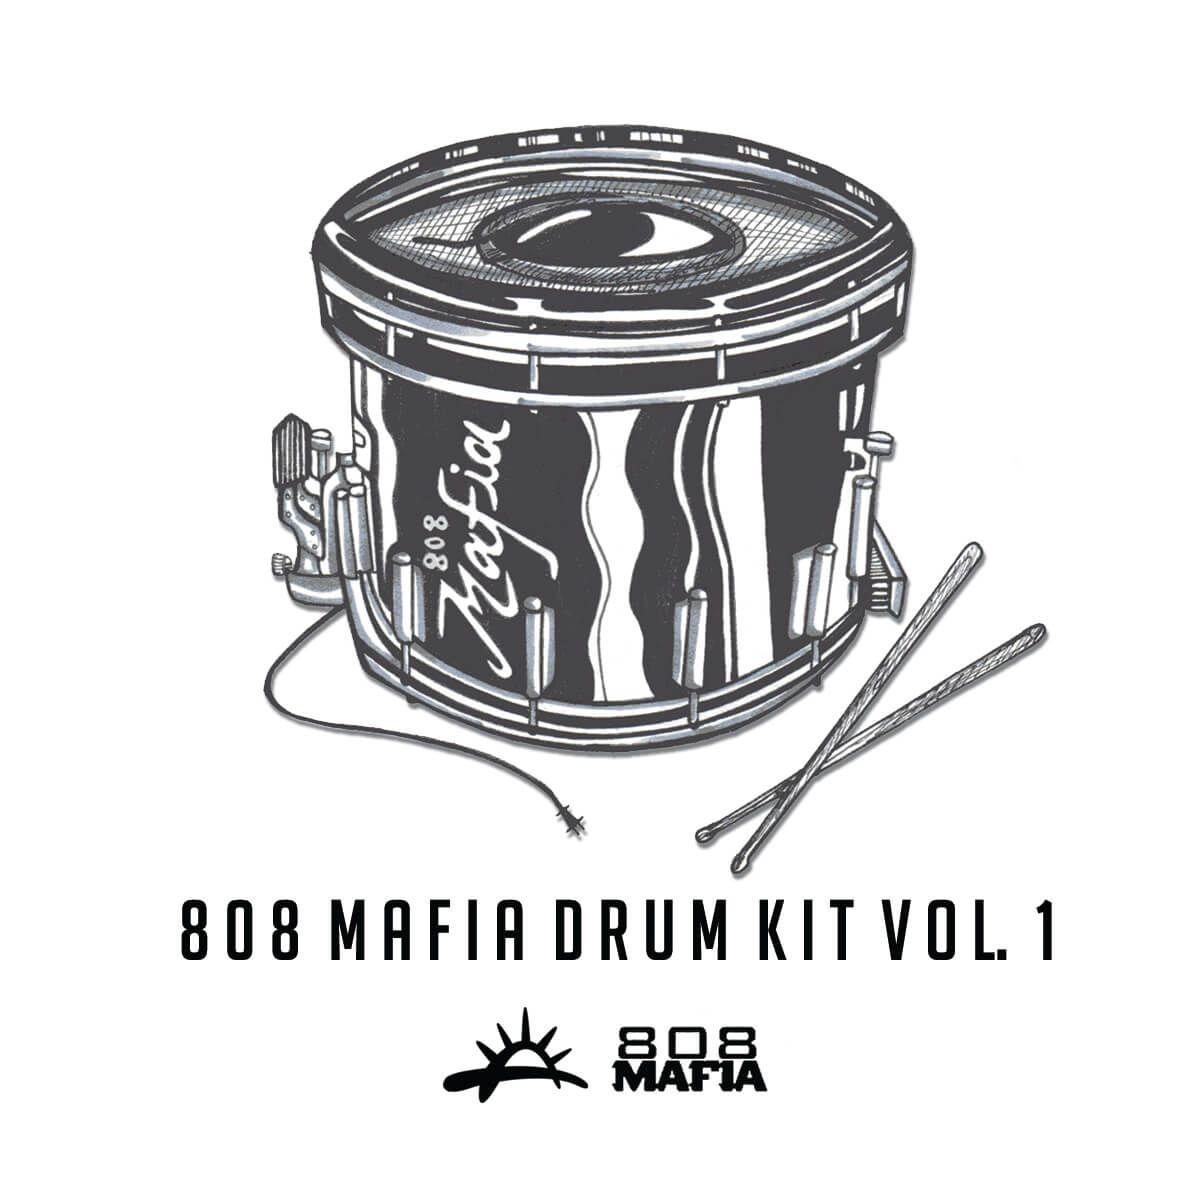 mafia music bass remix скачать